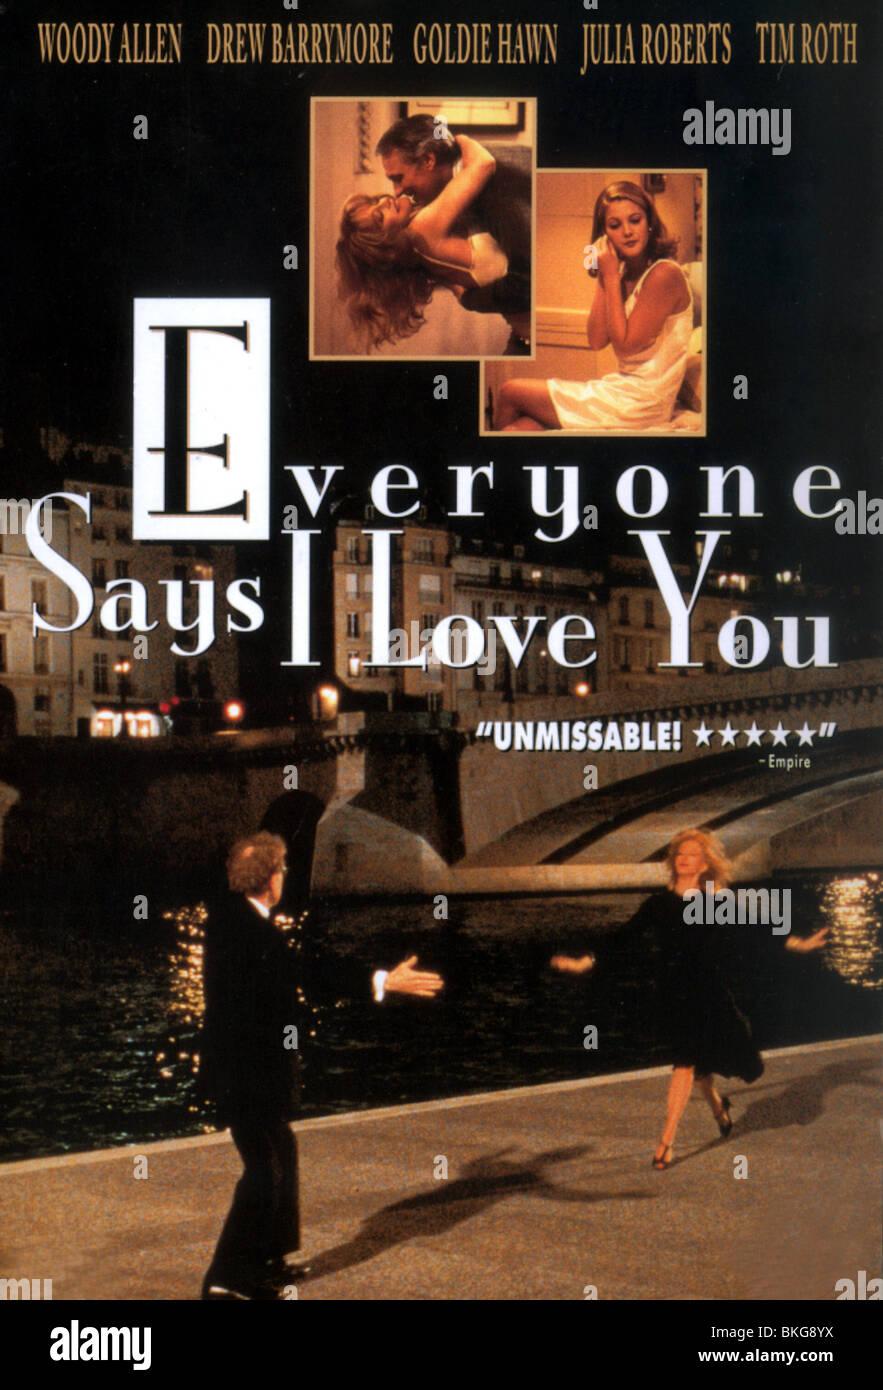 everybody says i love you